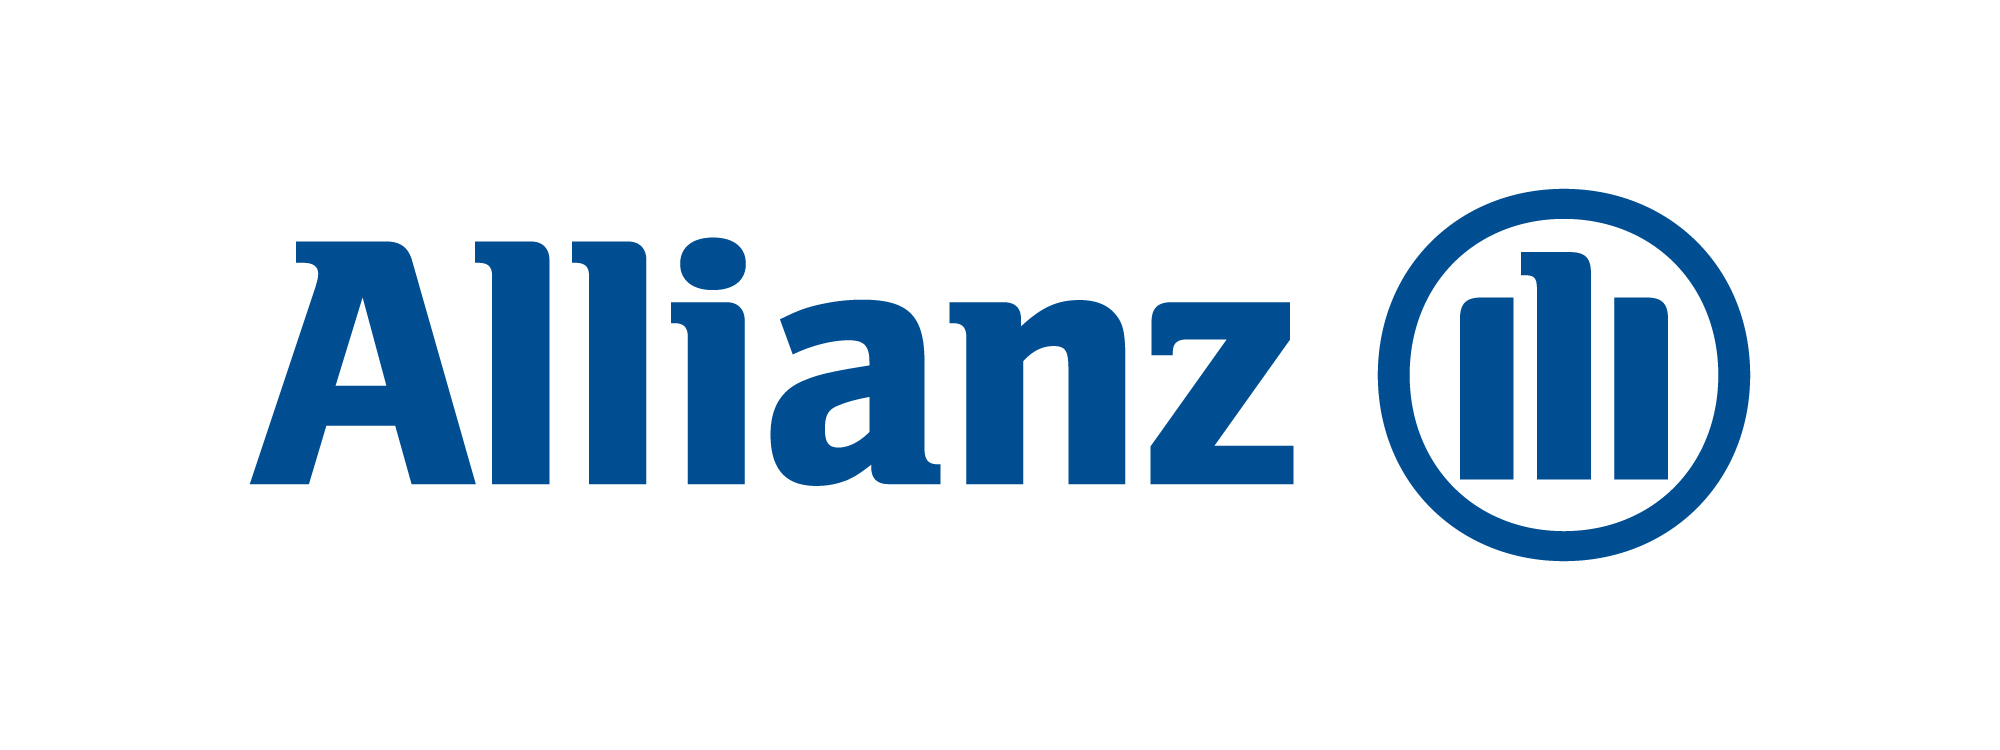 Is Allianz Rental Car Insurance Good